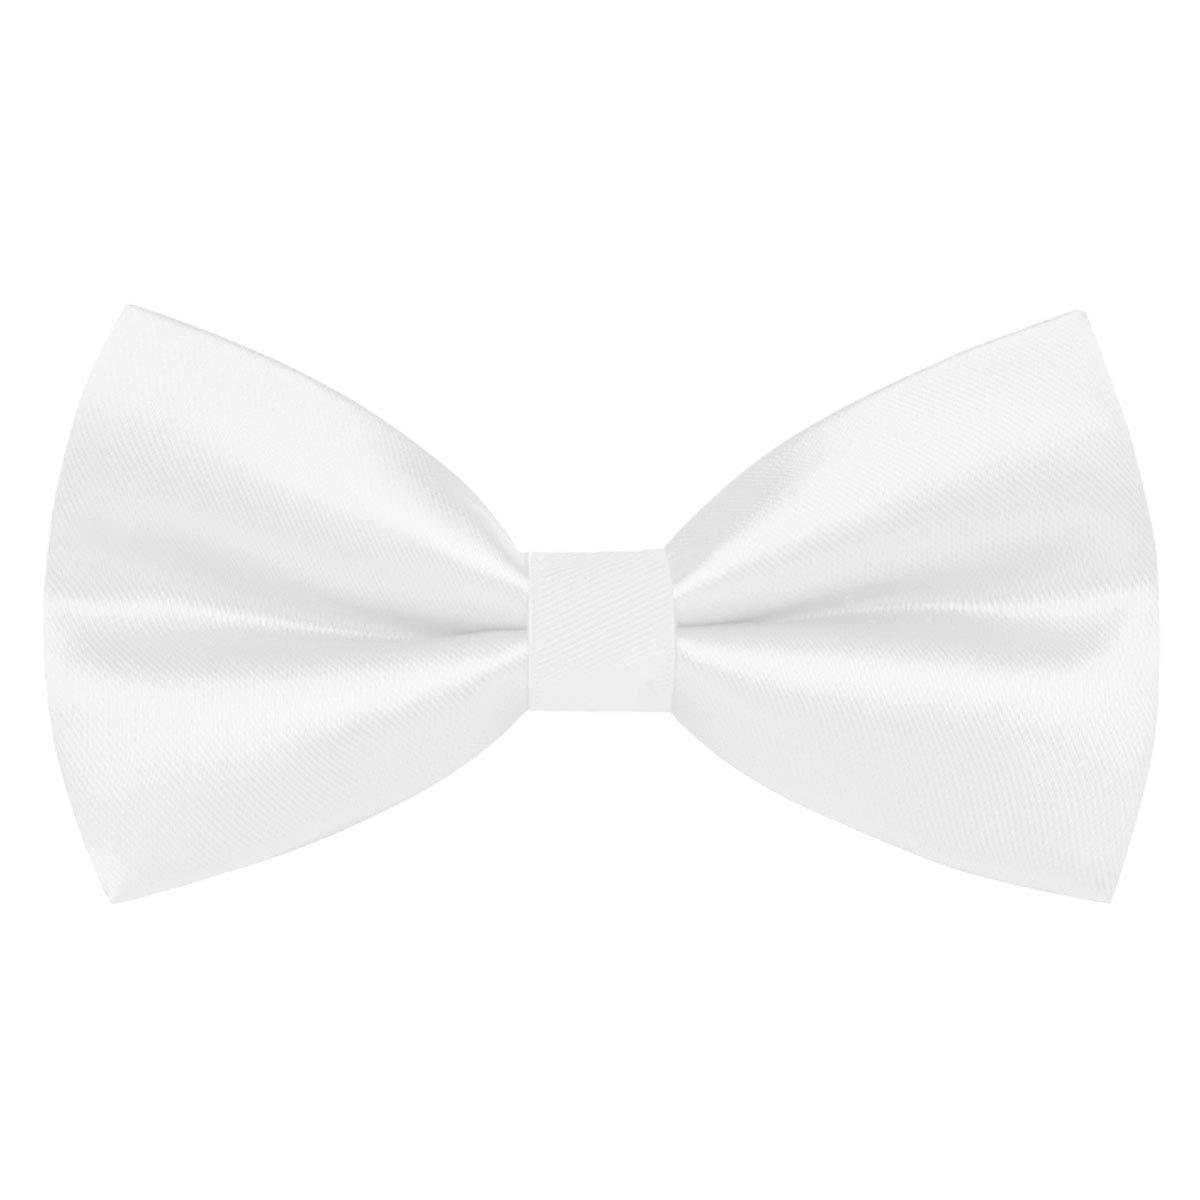 Wirarpa Mens Classic Pre-tied Bow Ties Clip On Formal Solid Tuxedo Adjustable Bowtie Wedding Light Blue Medium